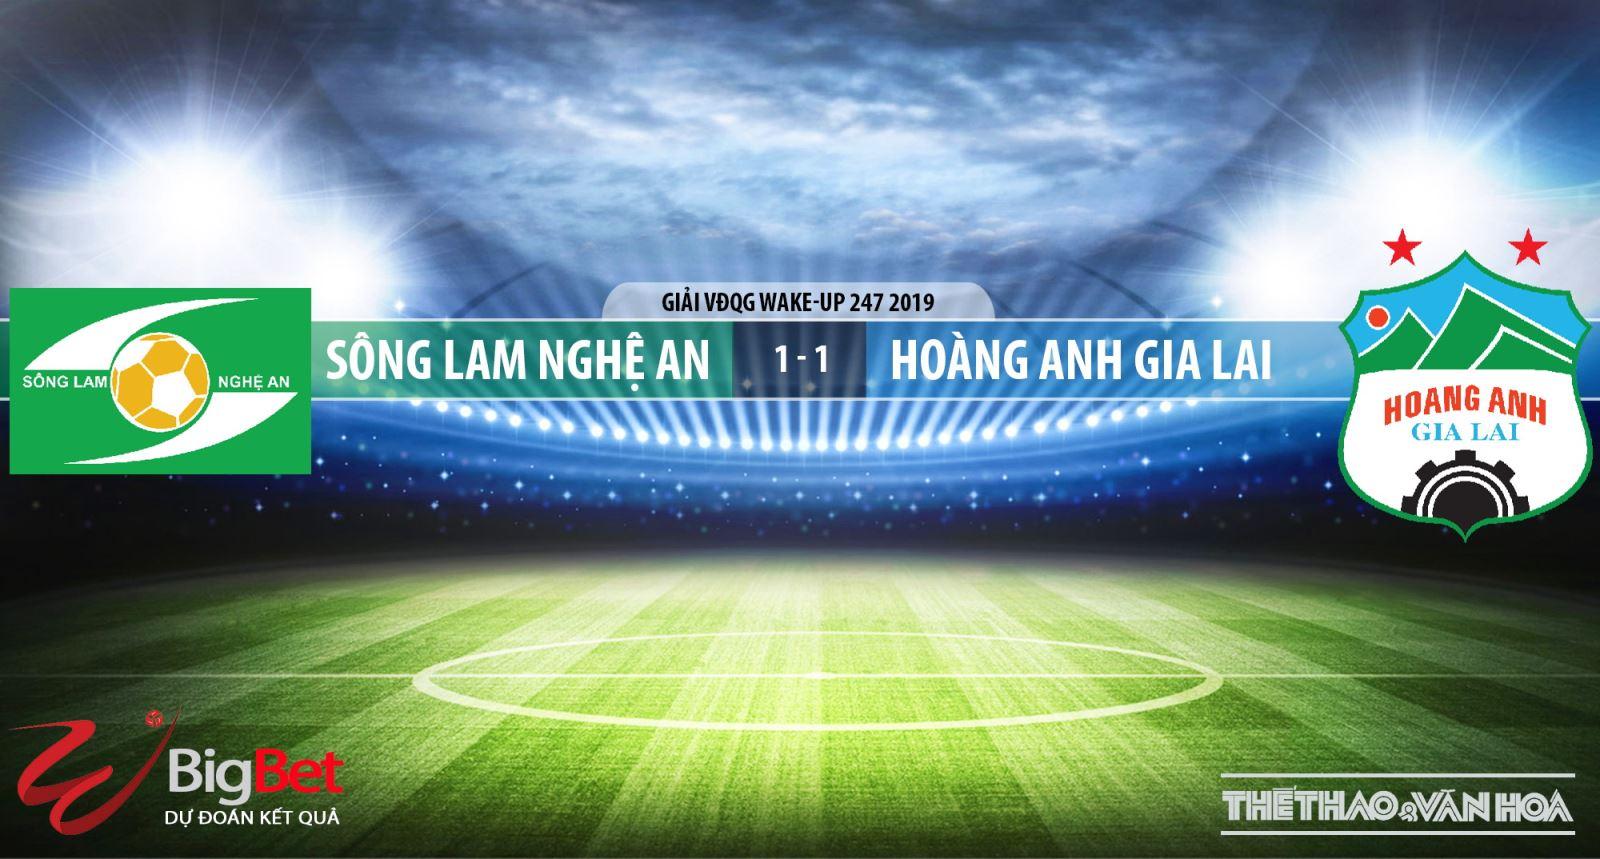 HAGL, SLNA, trực tiếp SLNA đấu với HAGL, trực tiếp SLNA vs HAGL, V-League 2019, xem trực tiếp SLNA vs HAGL ở đâu, bxh V League 2019, trực tiếp bóng đá, truc tiep bong da